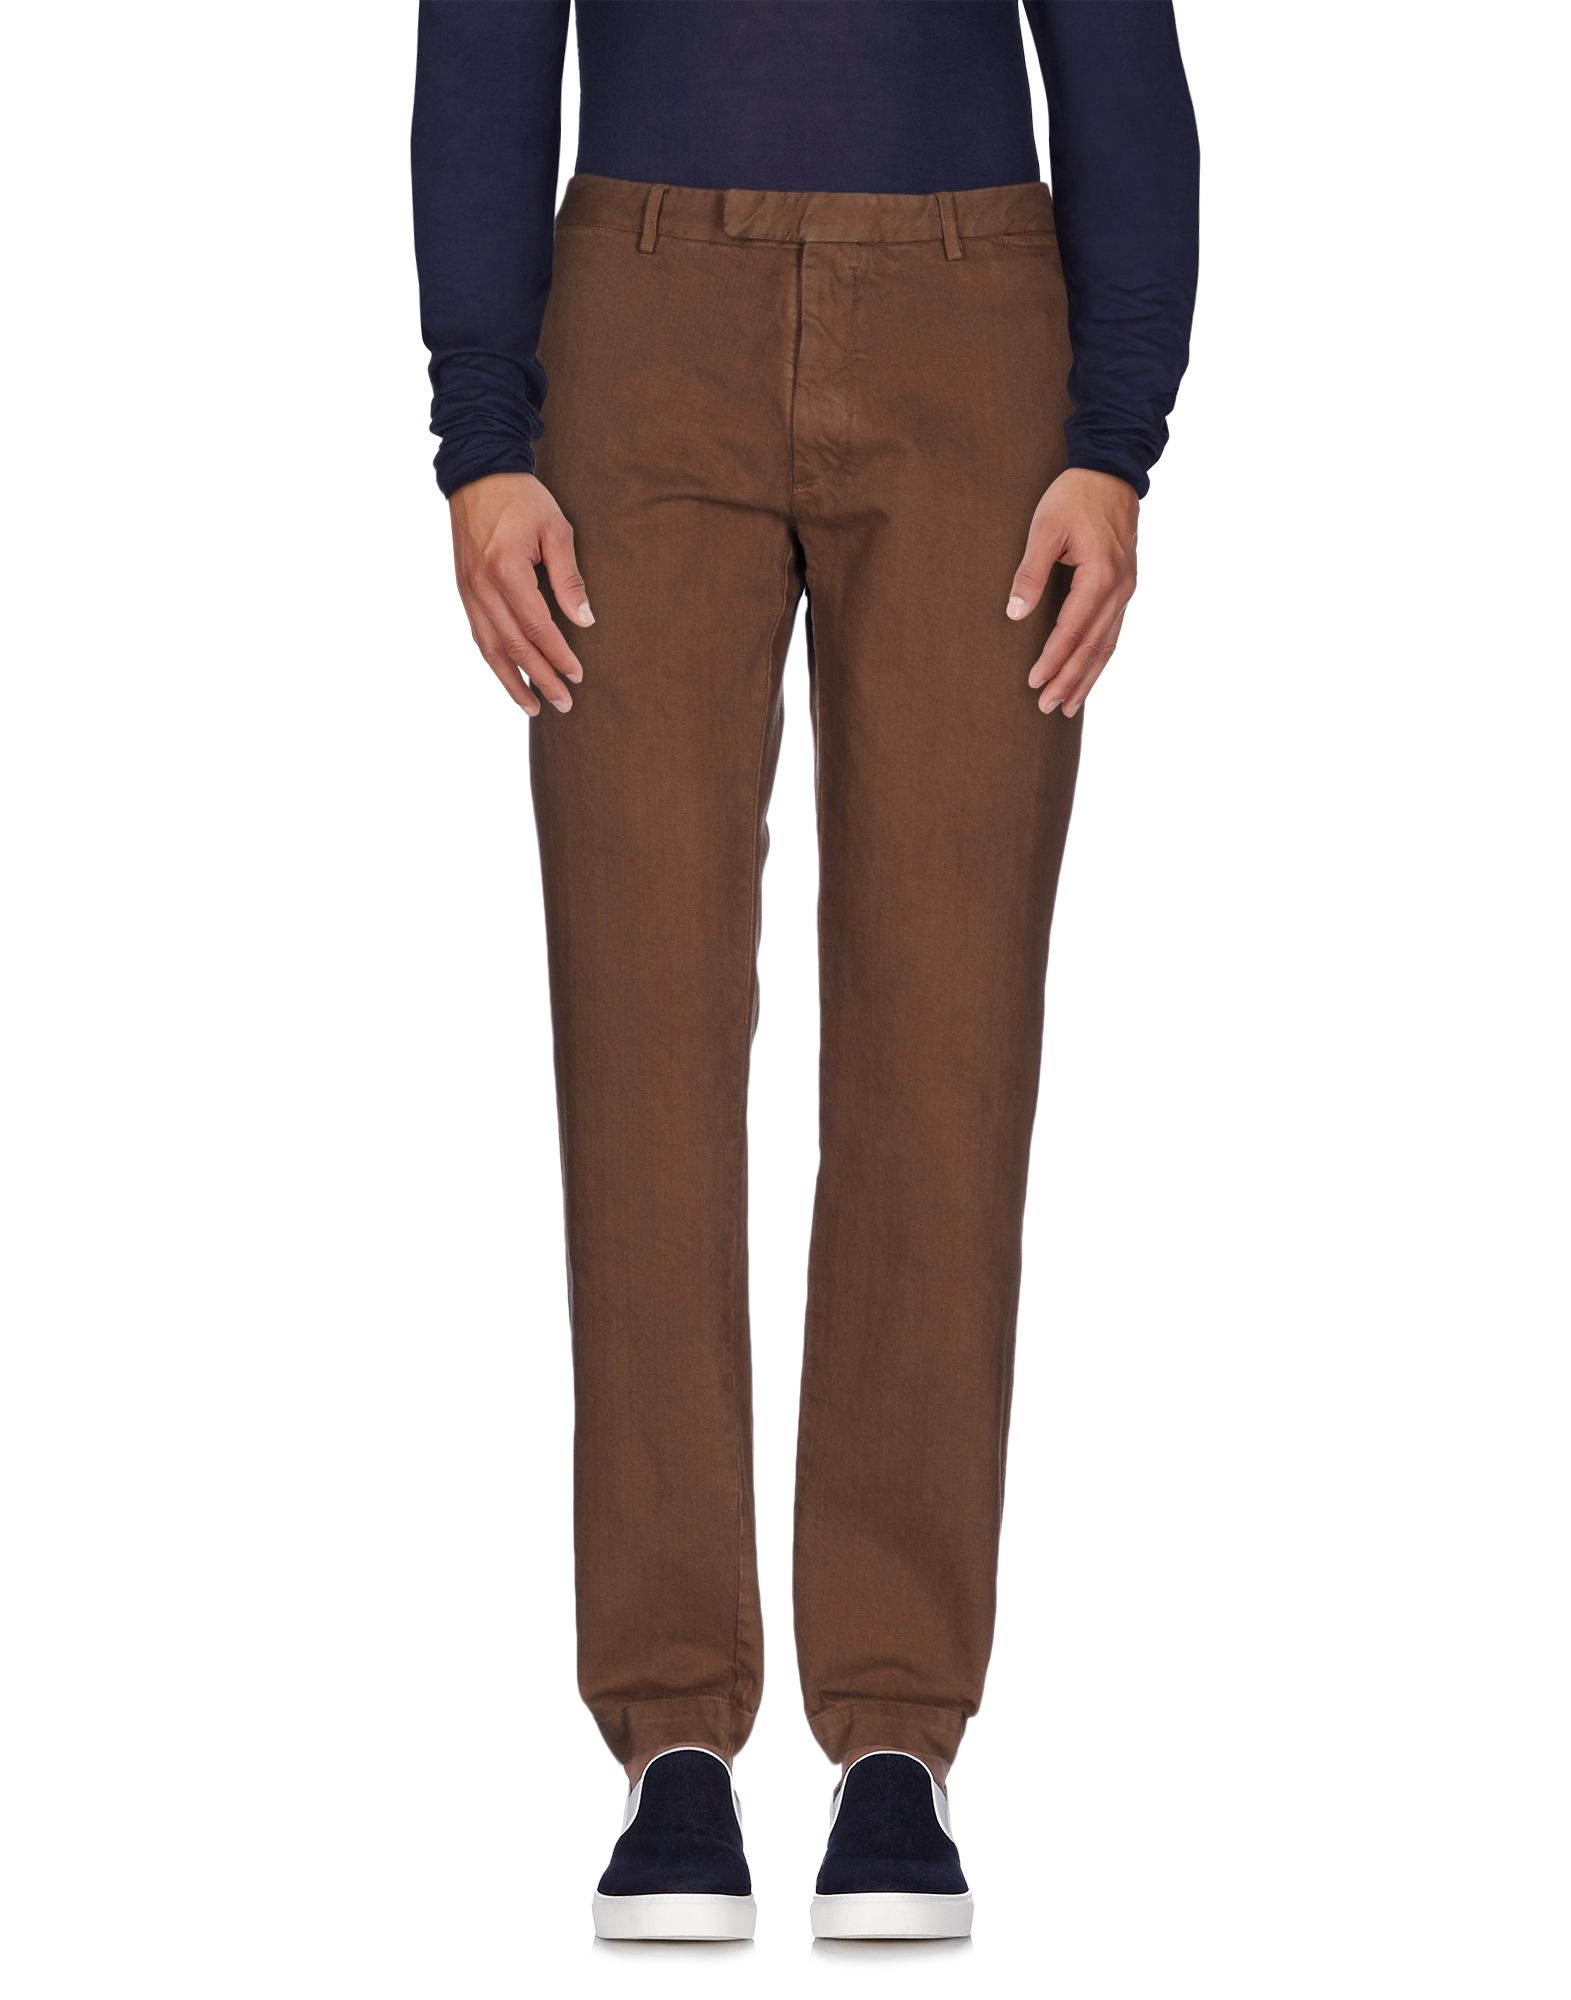 ALAIN Herren Jeanshose Farbe Khaki Größe 5